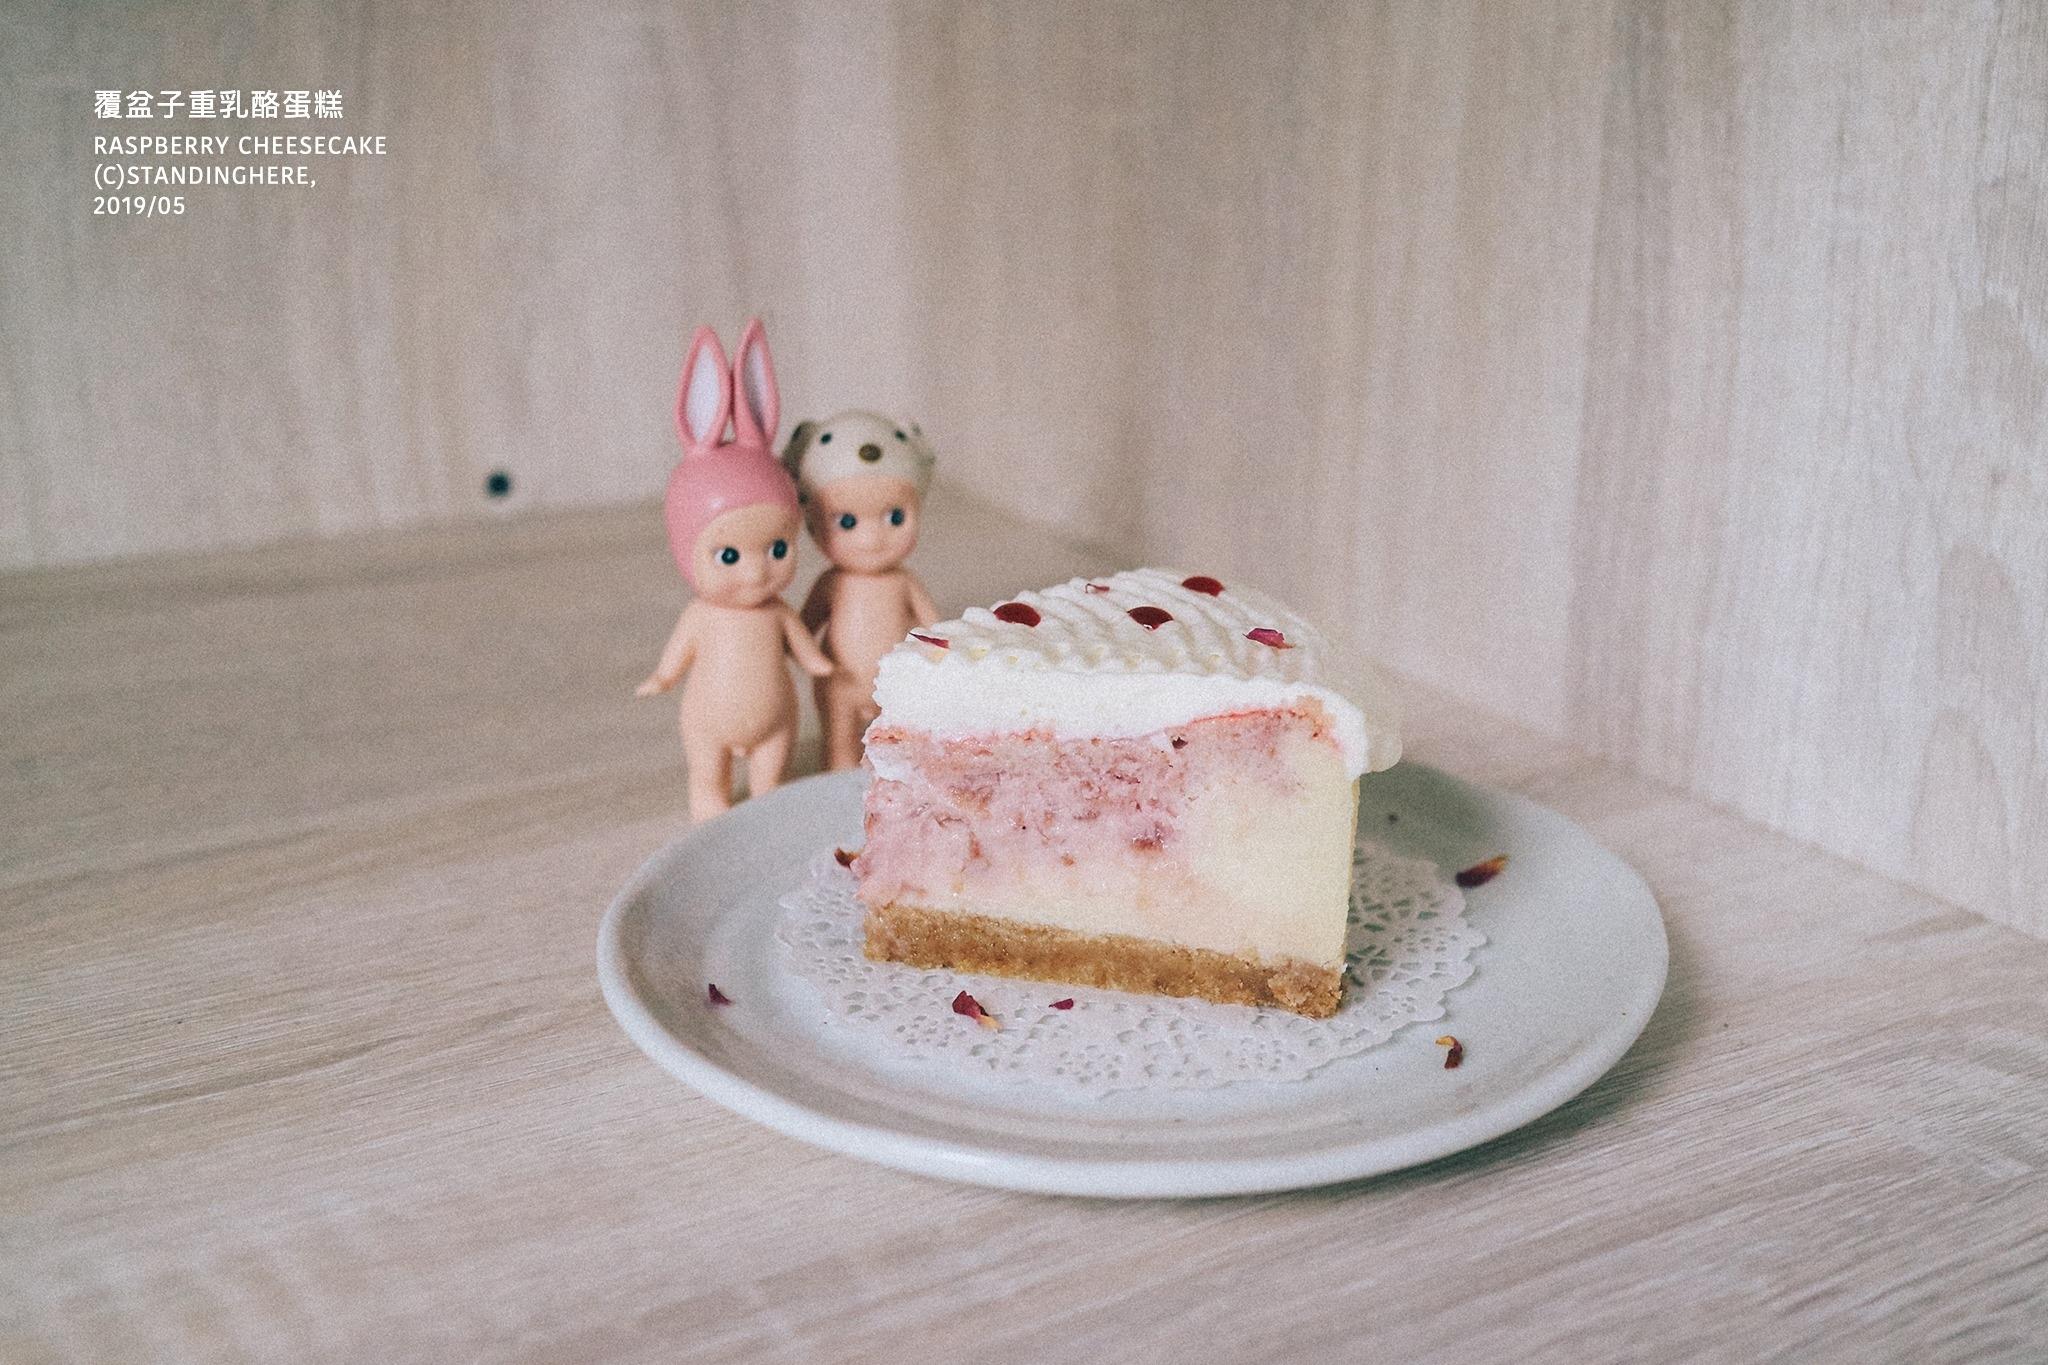 7-cake-覆盆子重乳酪.jpg